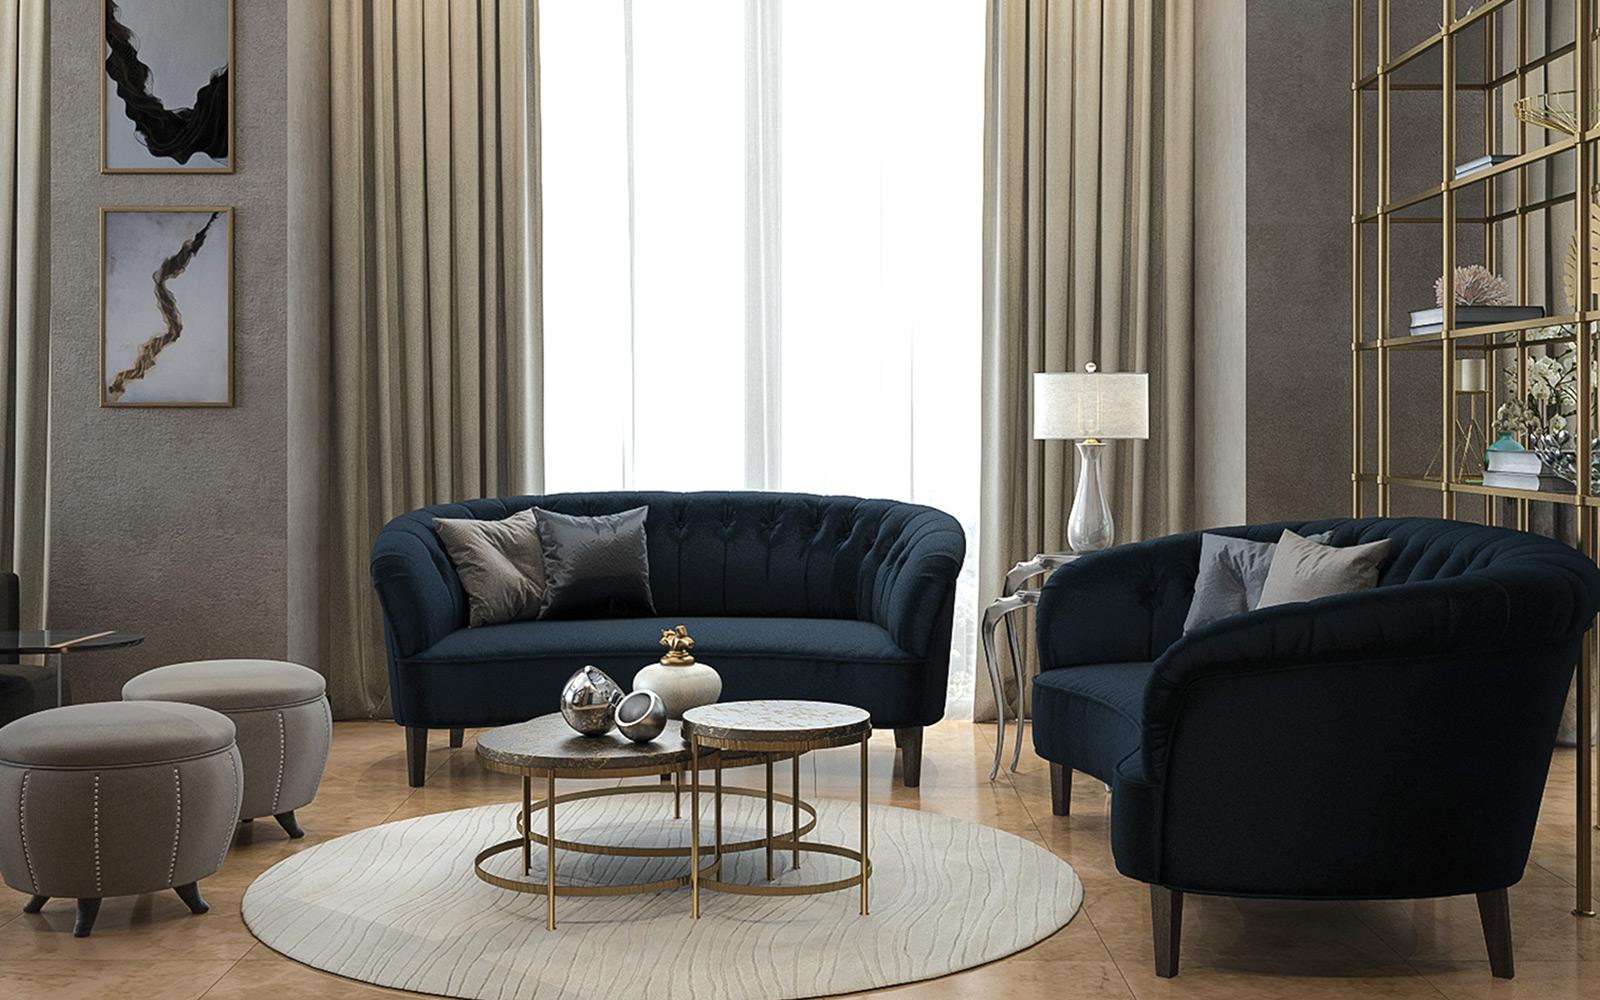 Vogue Design - Istanbul Basaksehir Flat1